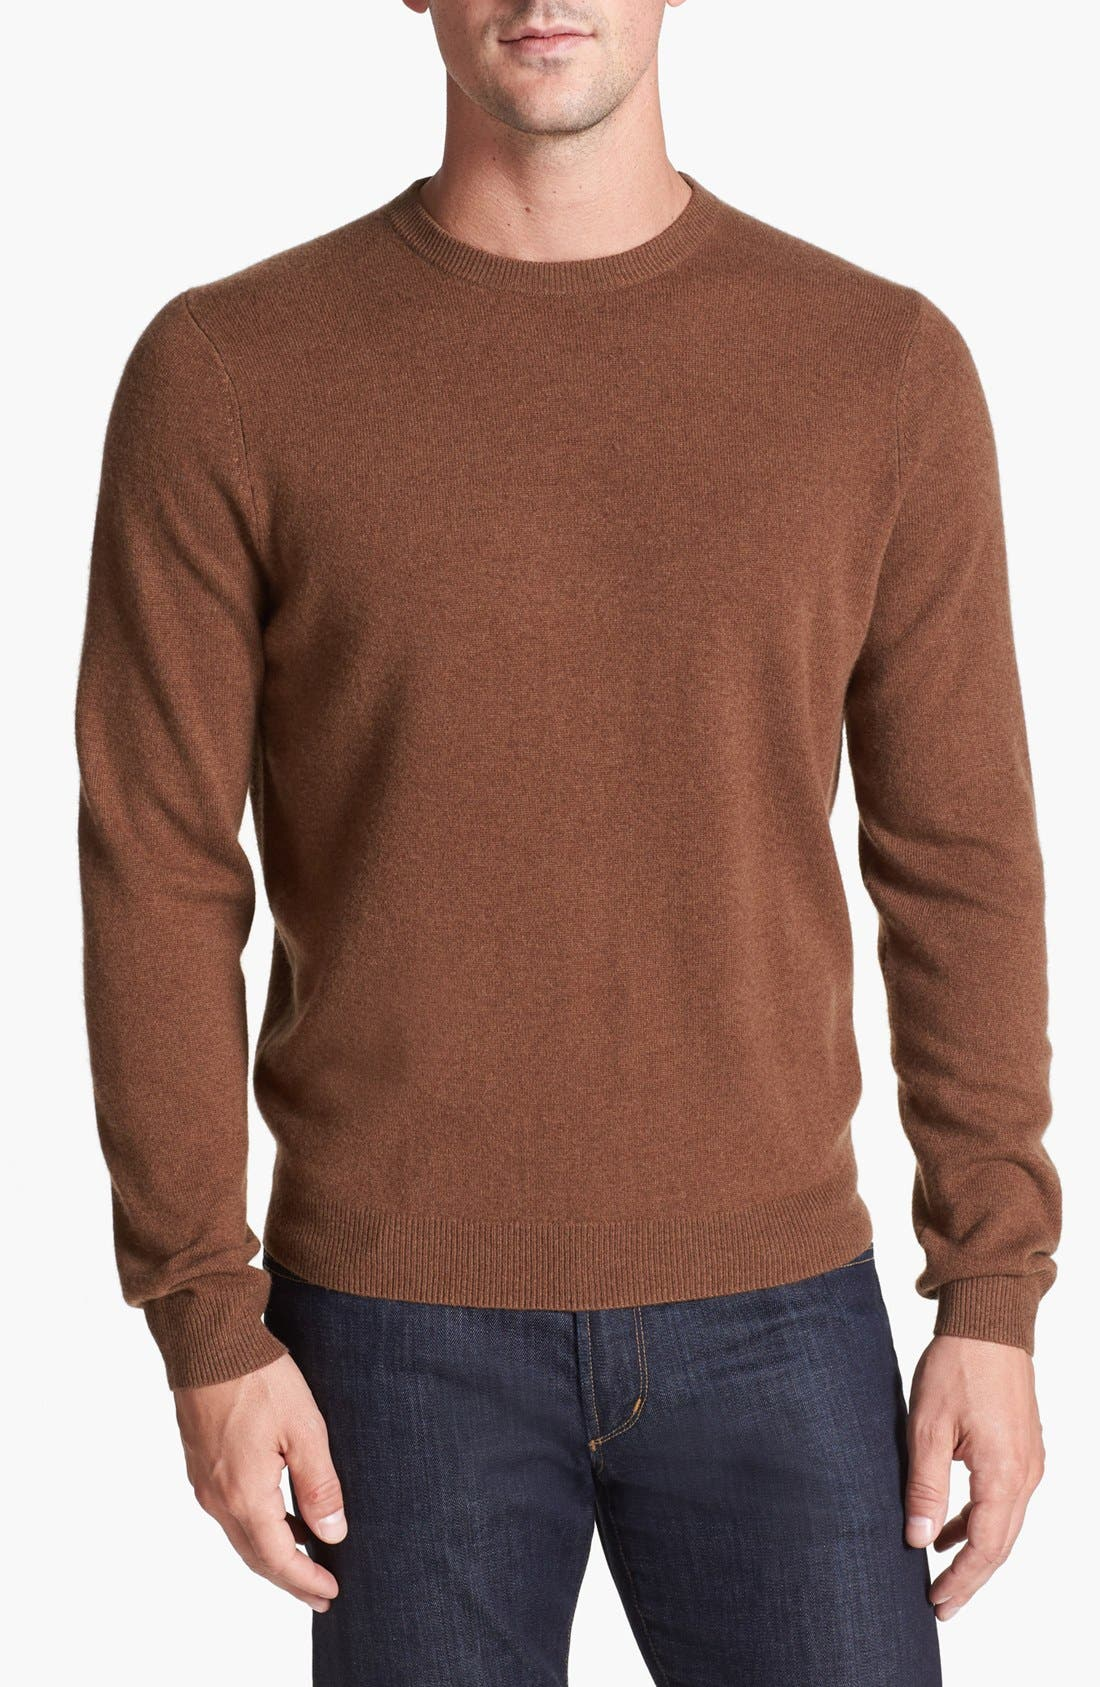 Alternate Image 1 Selected - Nordstrom Cashmere Crewneck Sweater